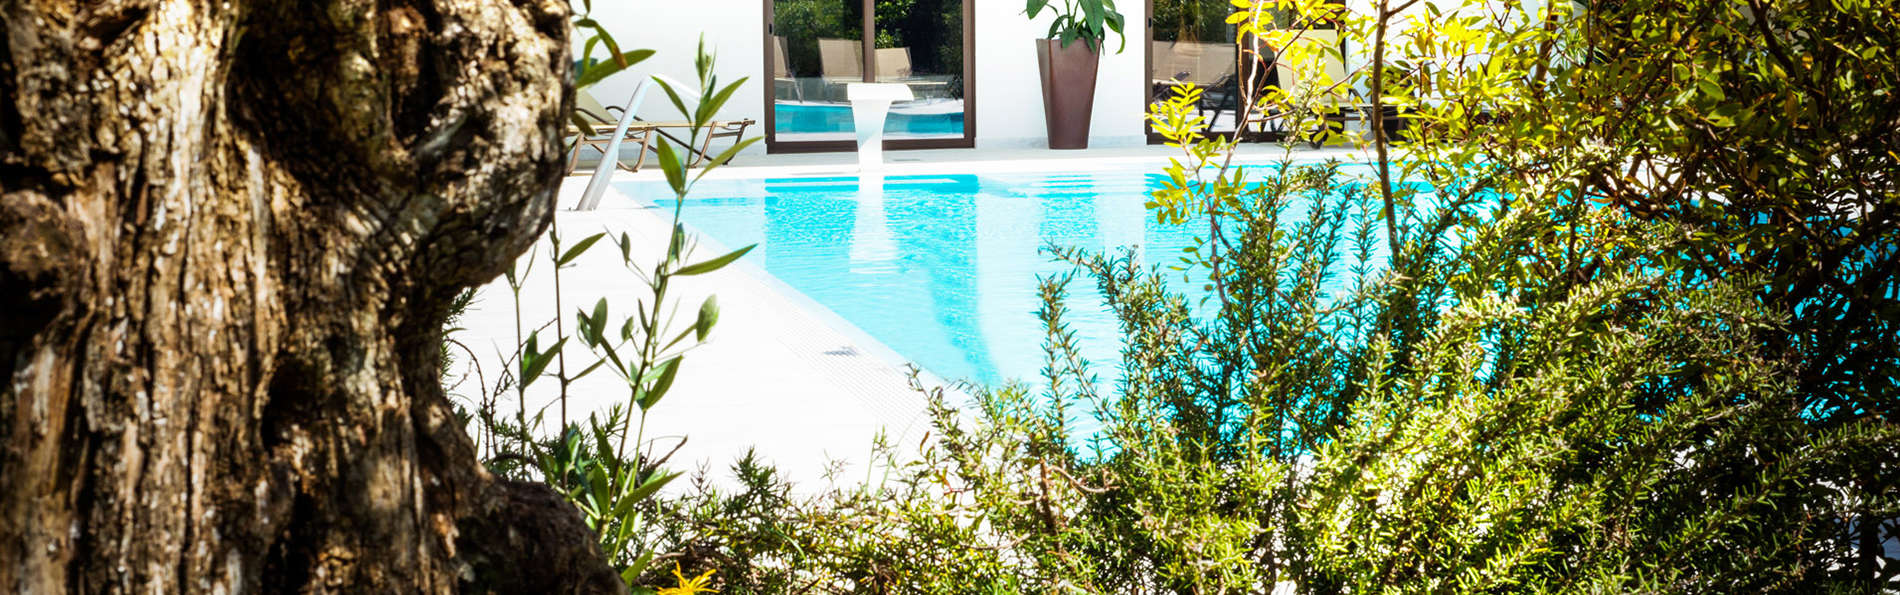 Hotel Riviera Ristorante Fofó - EDIT_HOTELRIVIERA-SPA-_2_.jpg